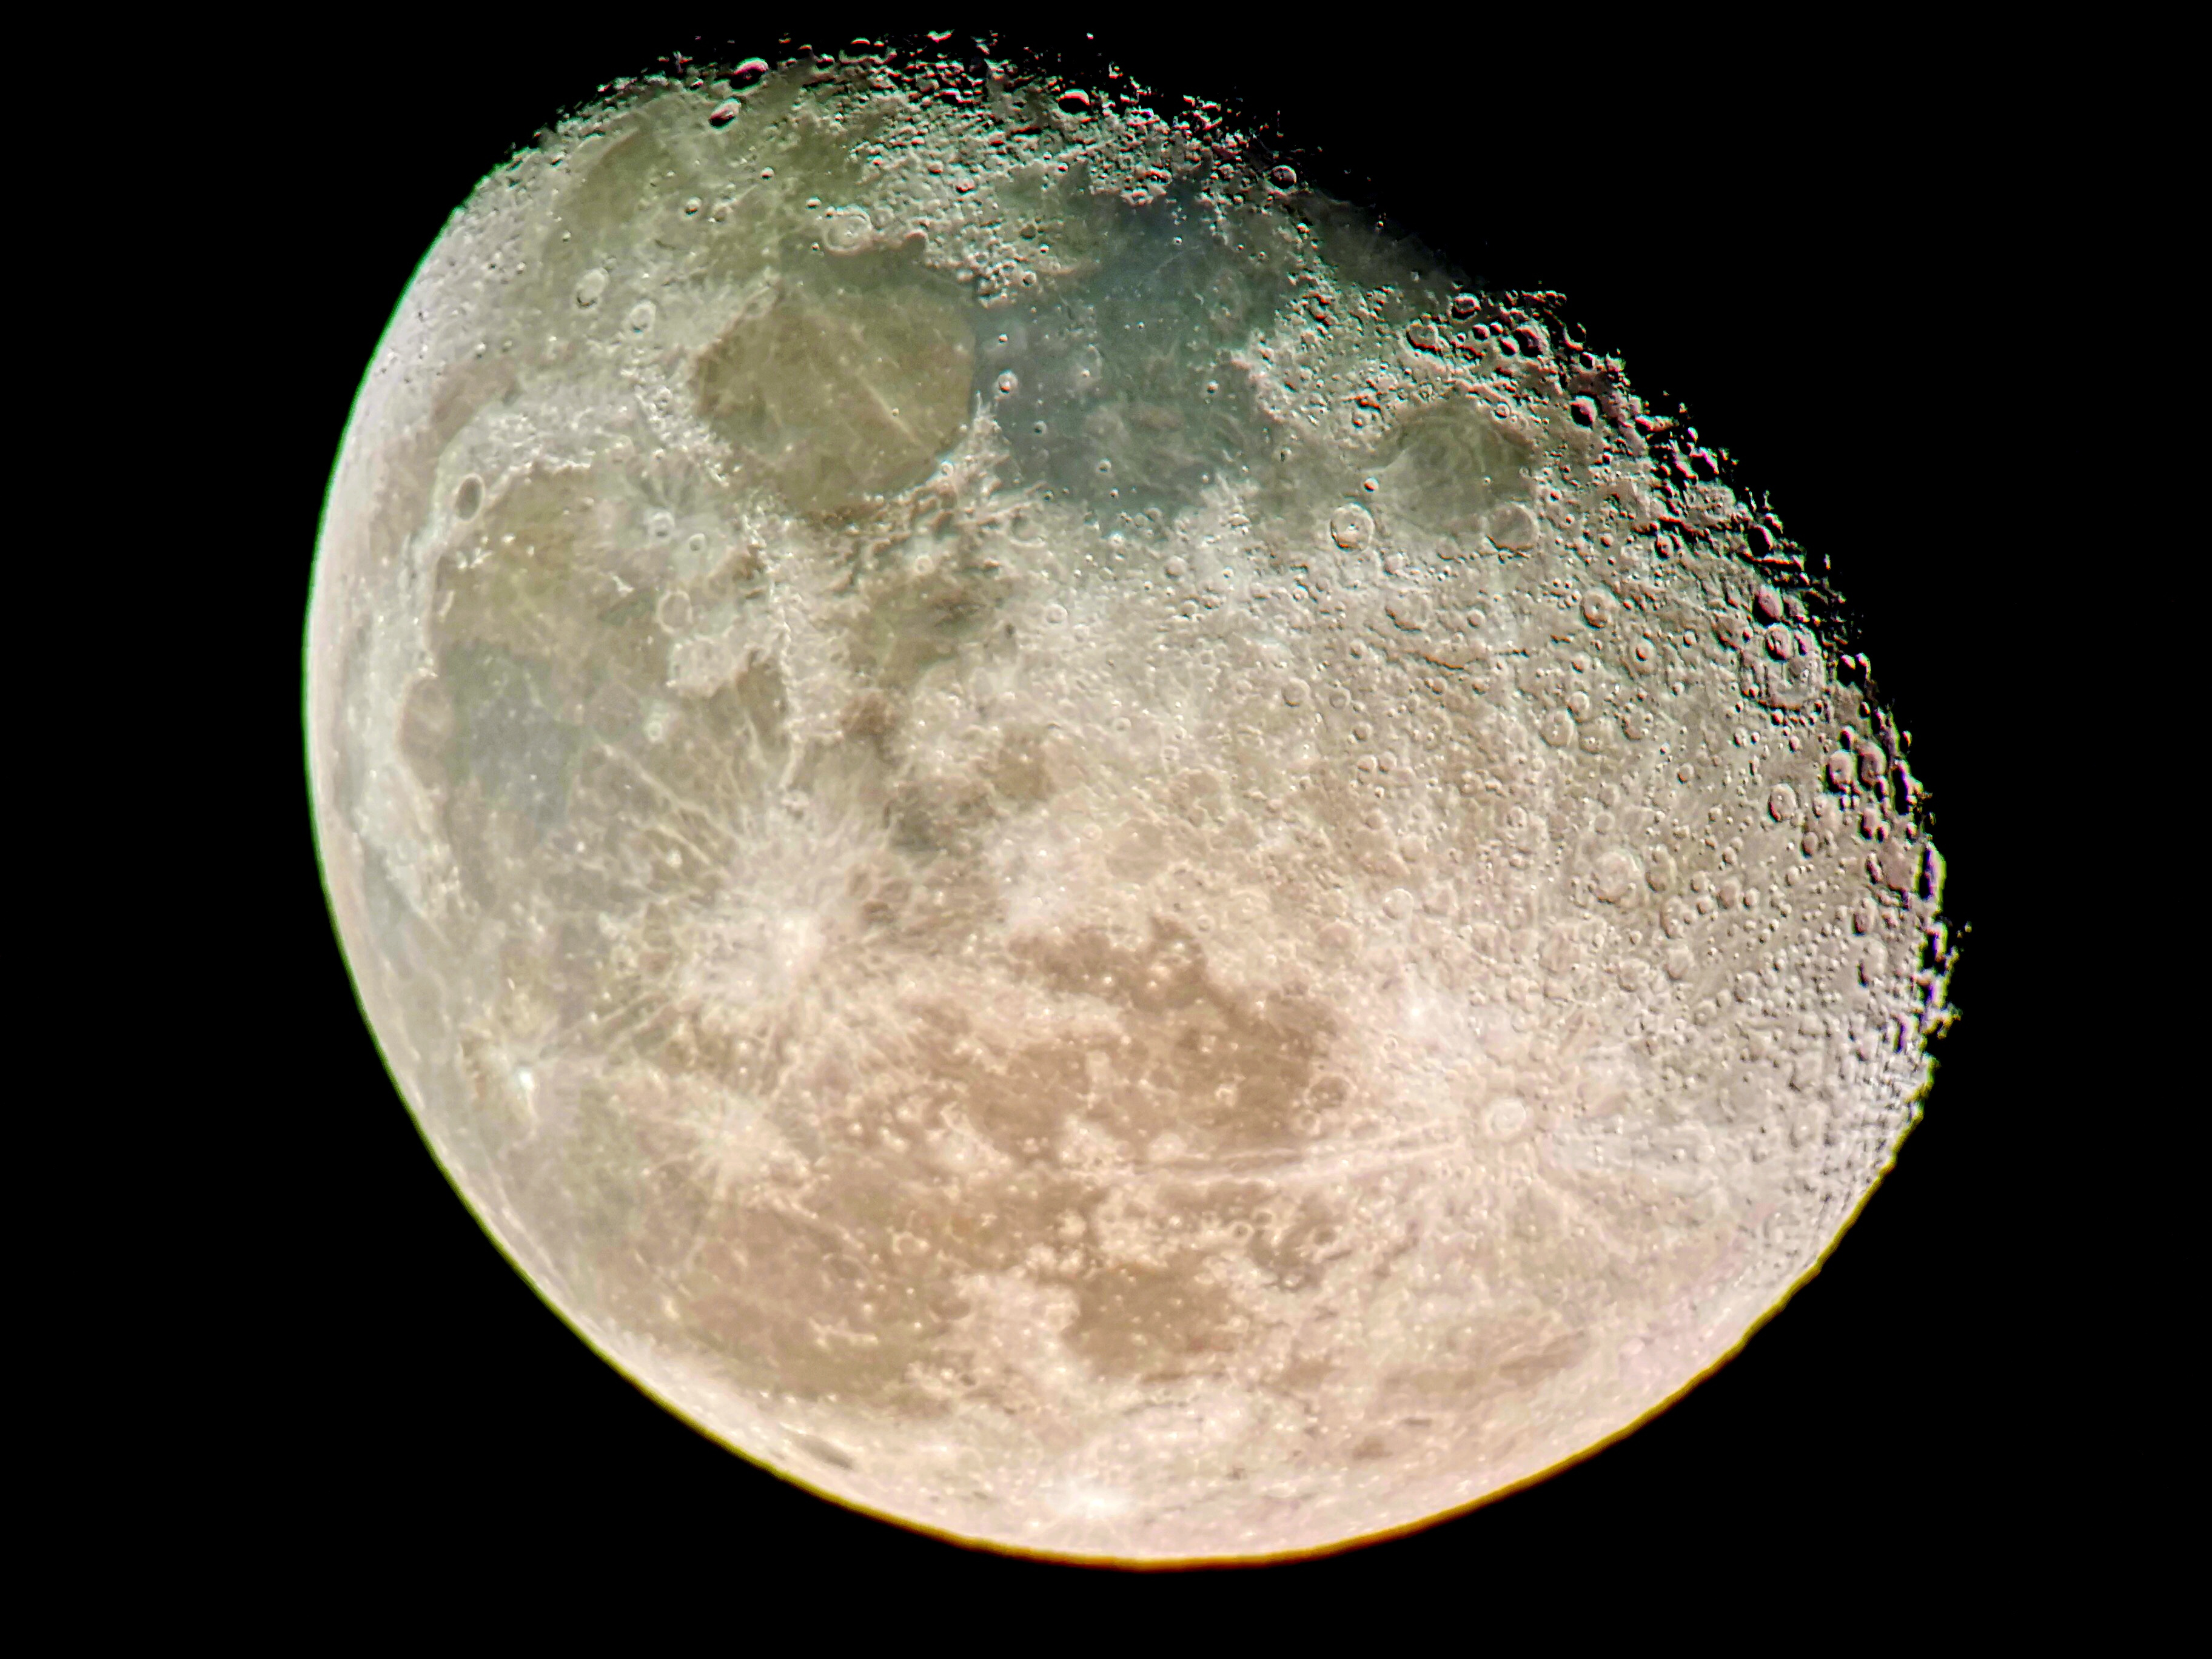 Lune_20190223_010911_bis_descendante.jpg